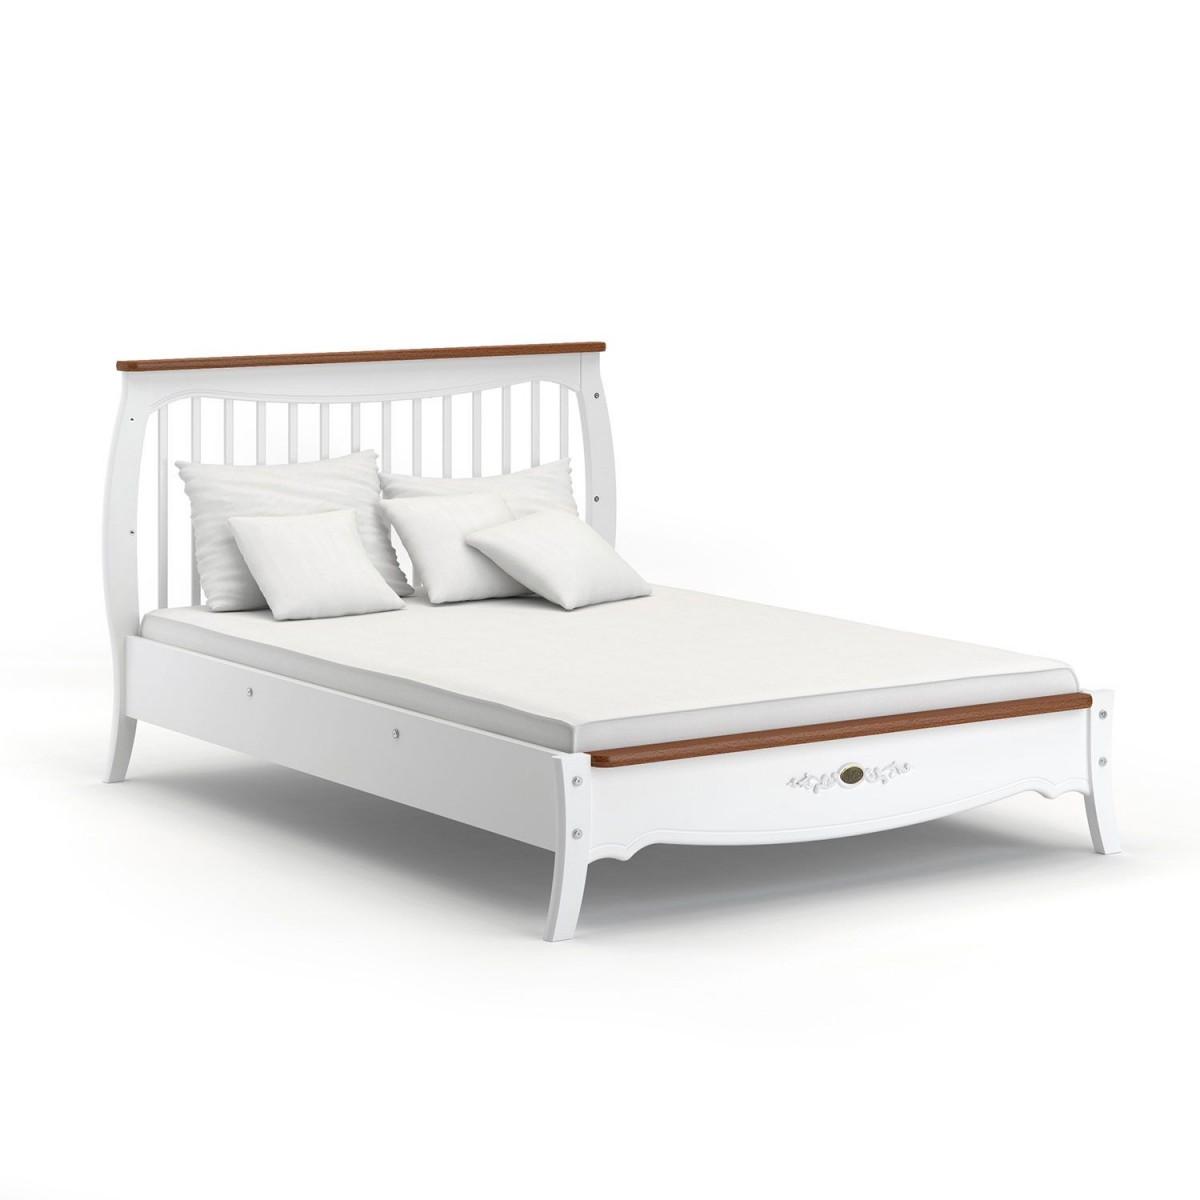 Nuovita Astro кровать-трансформер